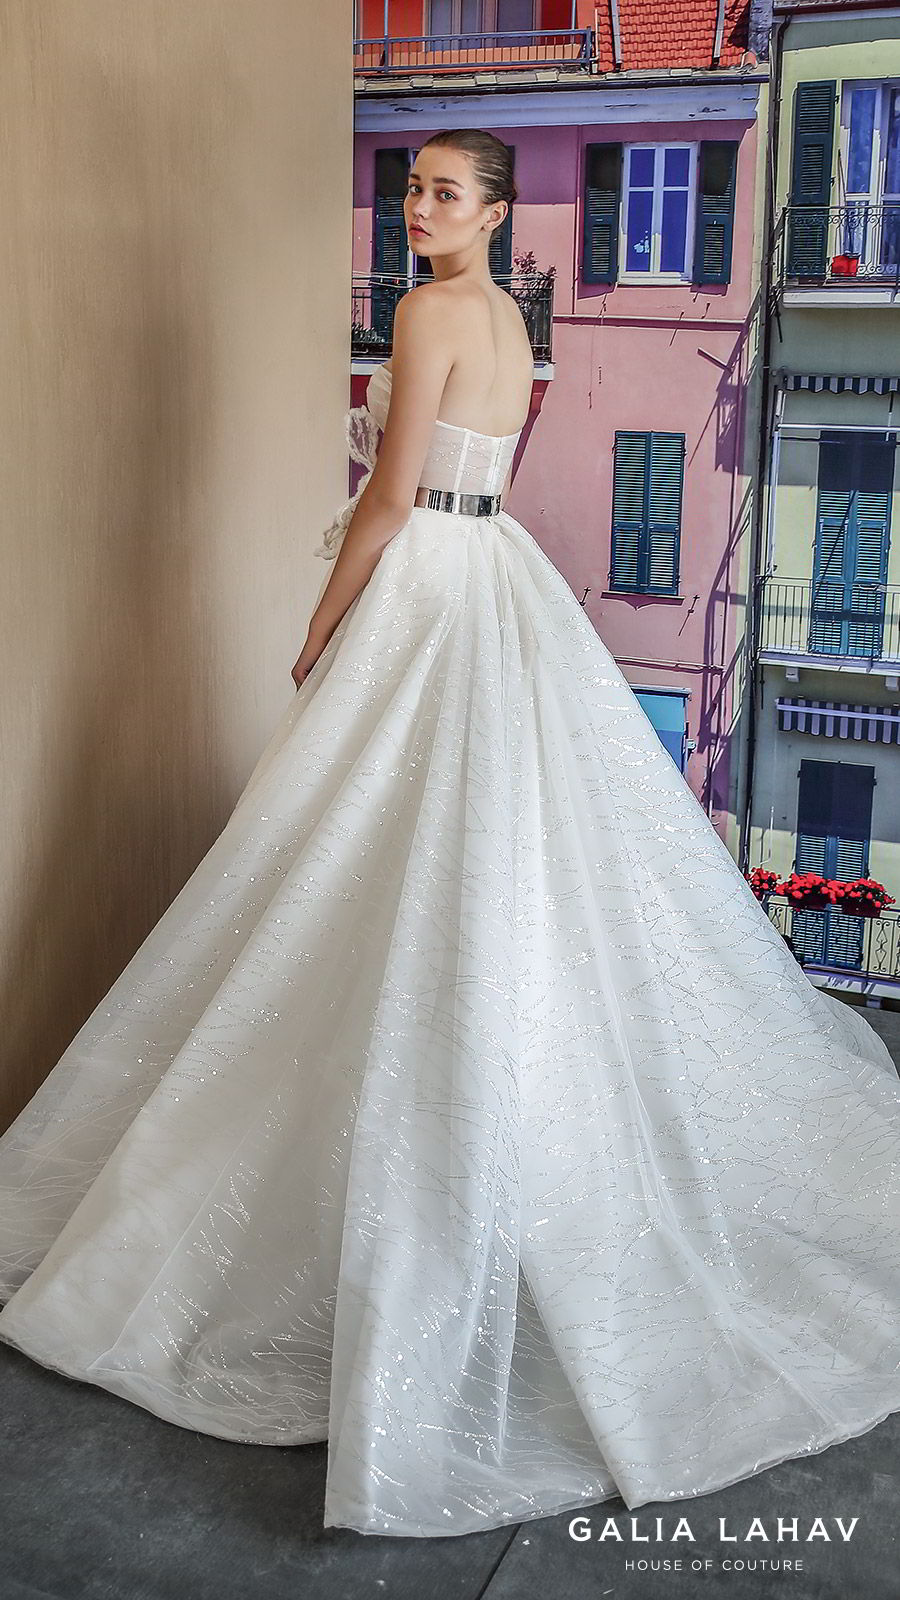 galia lahav fall 2019 bridal strapless sweetheart glitzy ball gown wedding dress slit skirt romantic sweep train (magdalena) bv